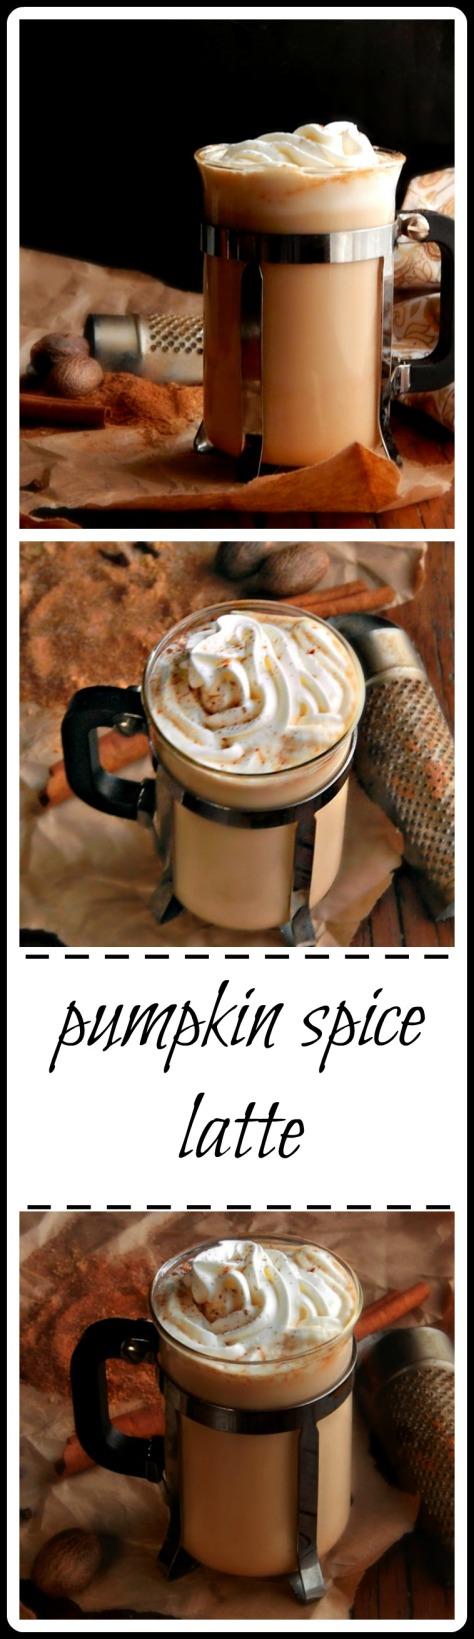 Pumpkin Spice Latte - simple, frugal & minutes to make!